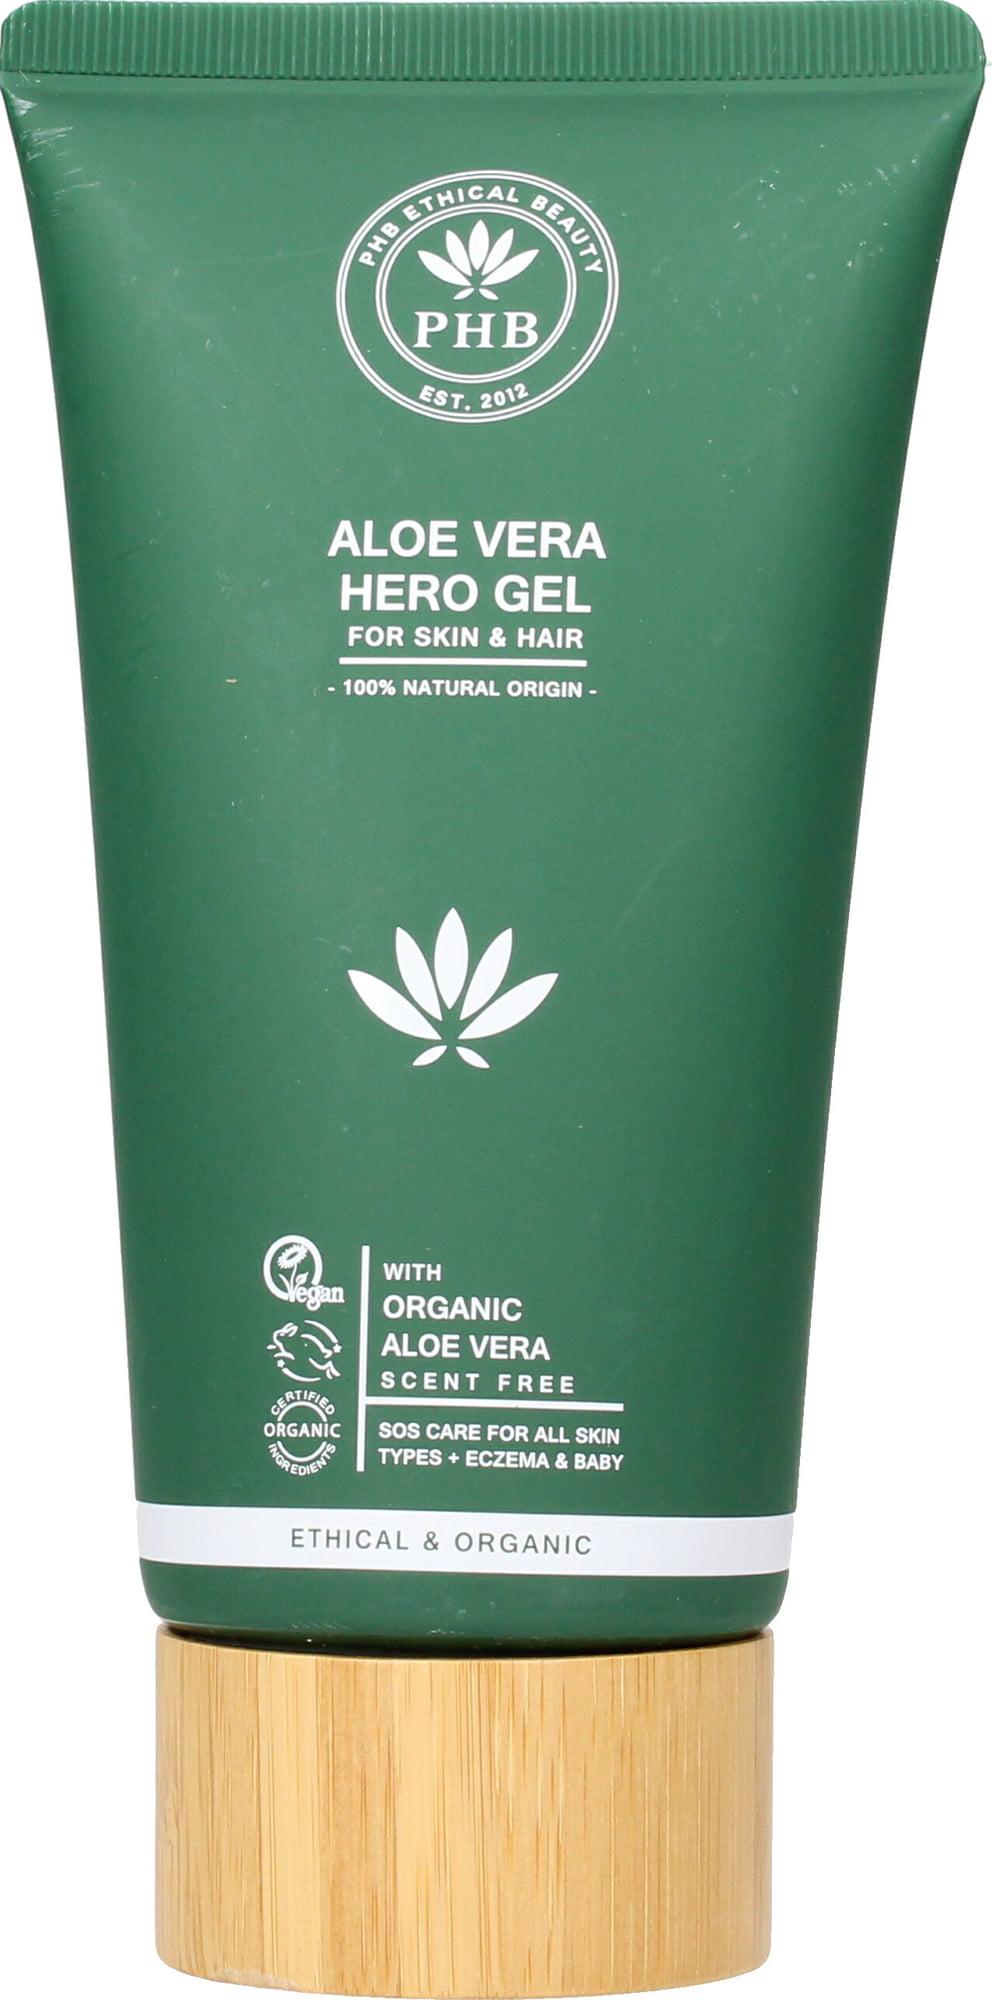 PHB ETHICAL BEAUTY Aloe Vera Hero Gel